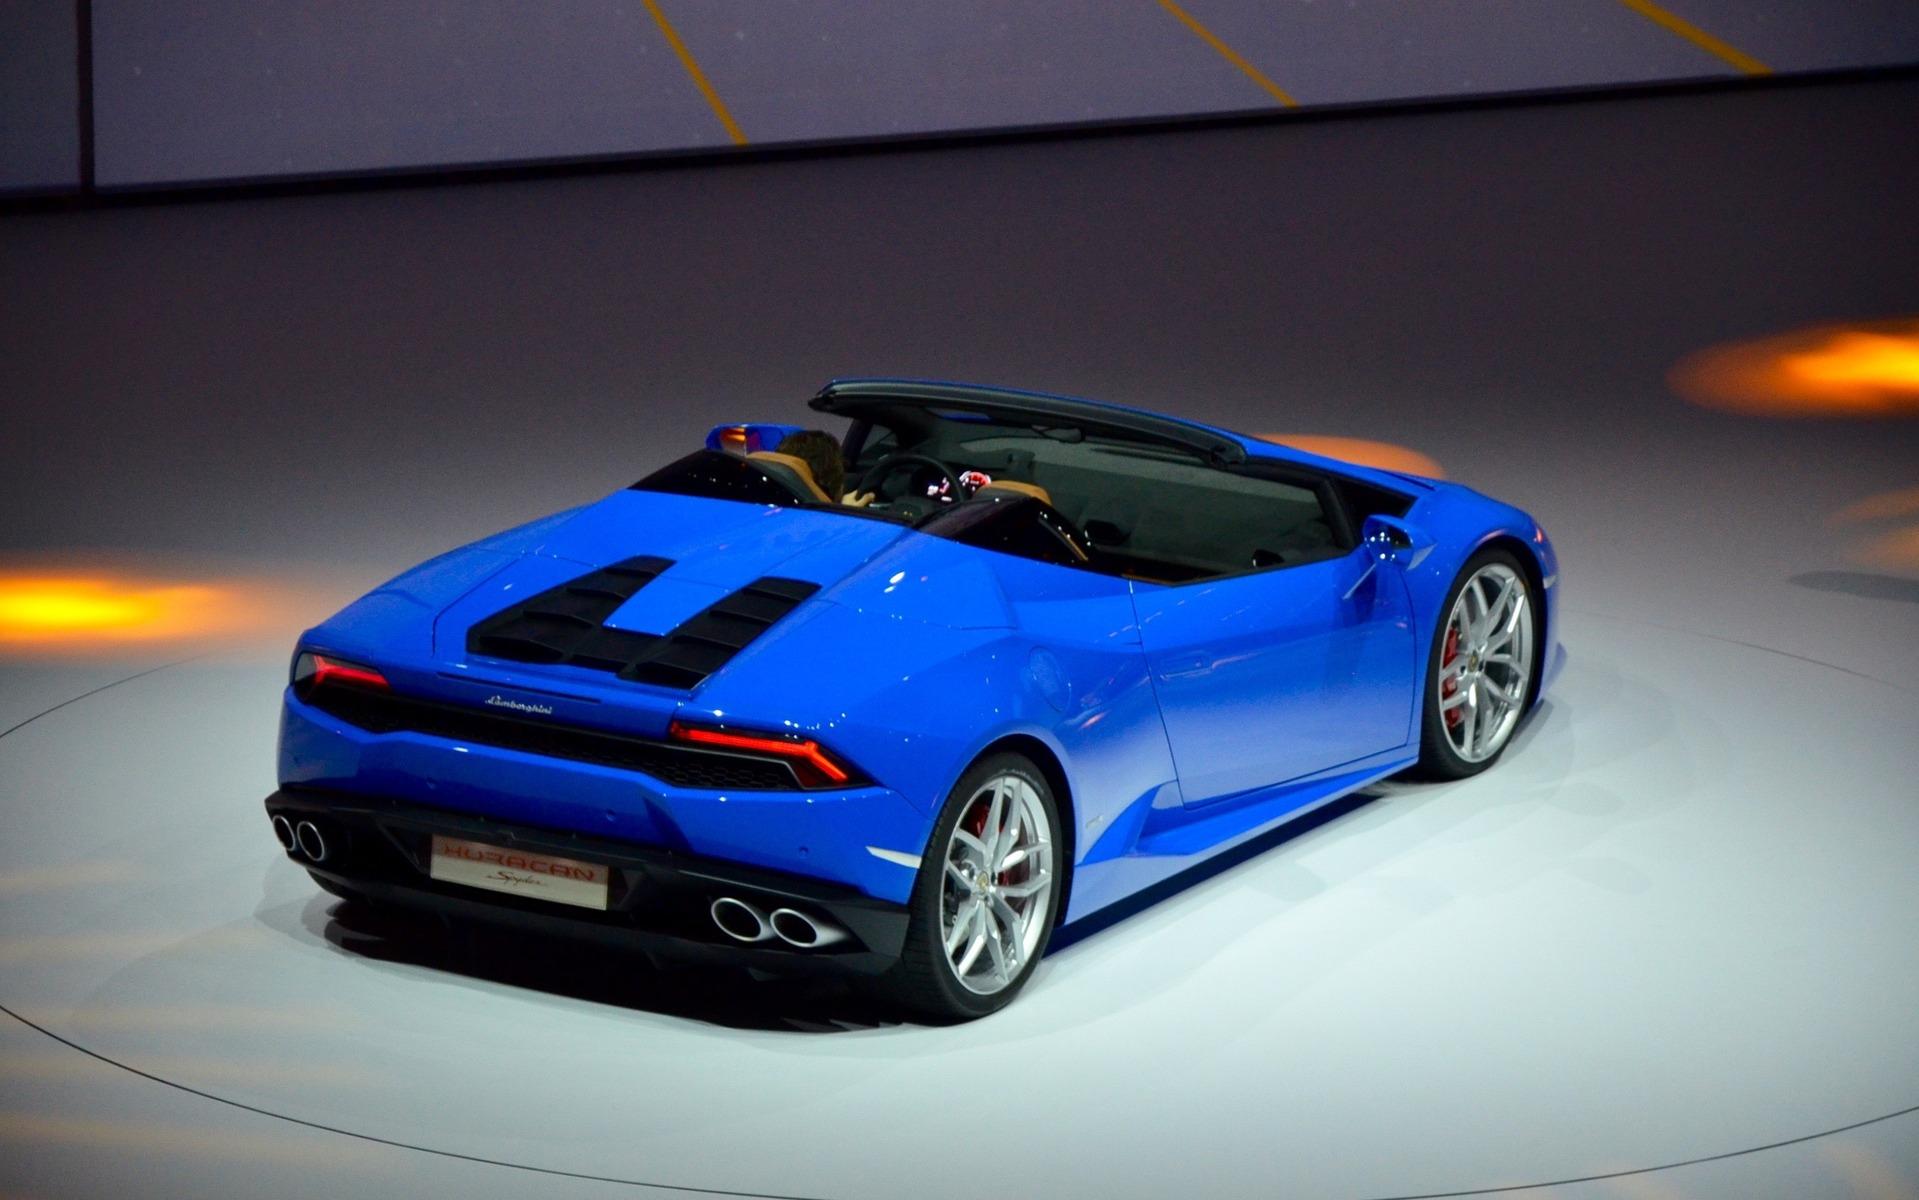 Lamborghini LP 610-4 Spyder